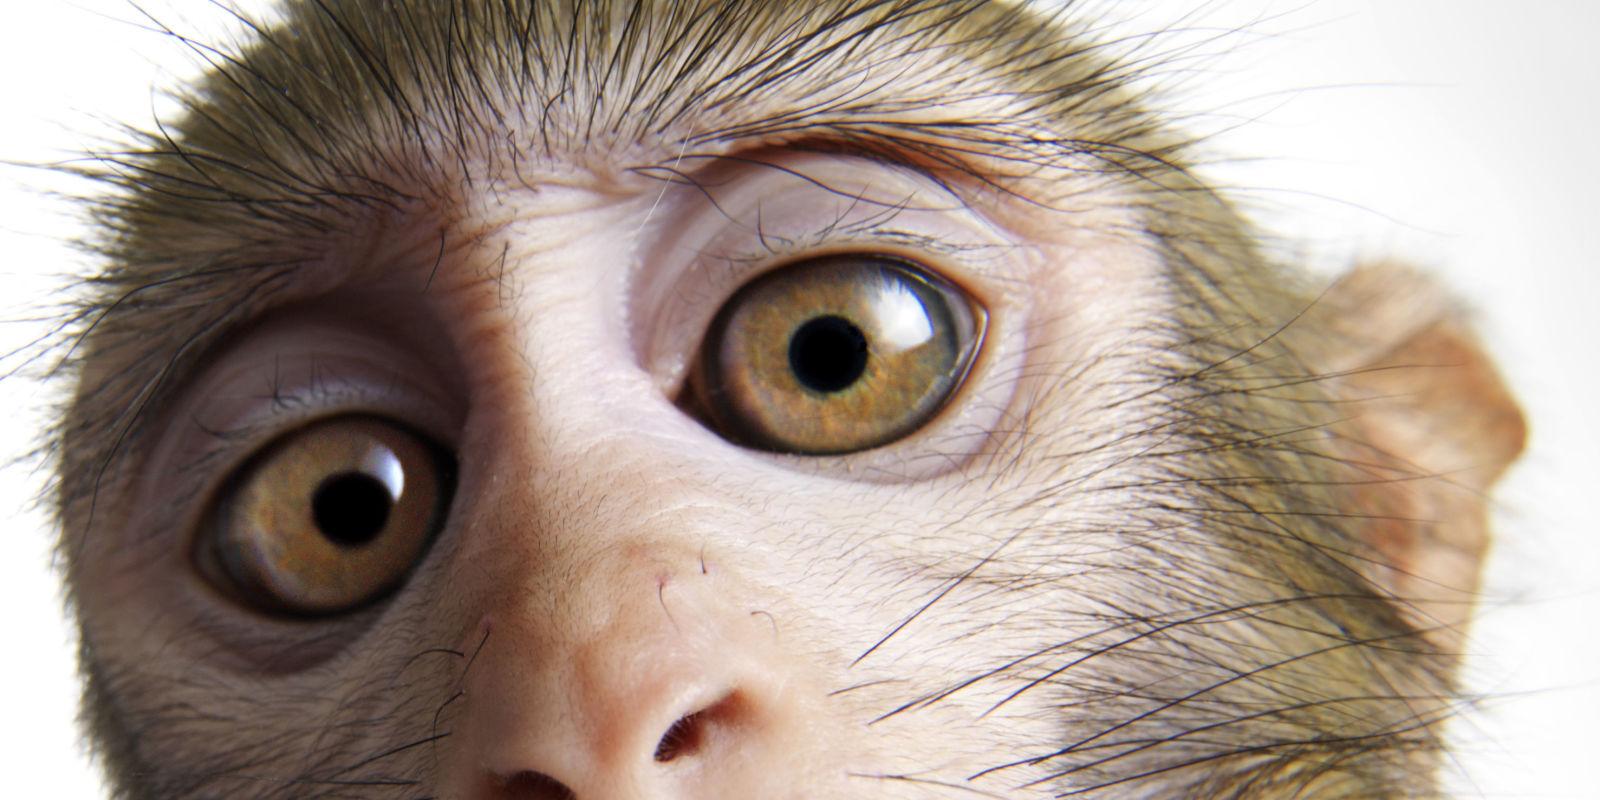 LabGrown Cells Restore Sight to Blind Monkeys